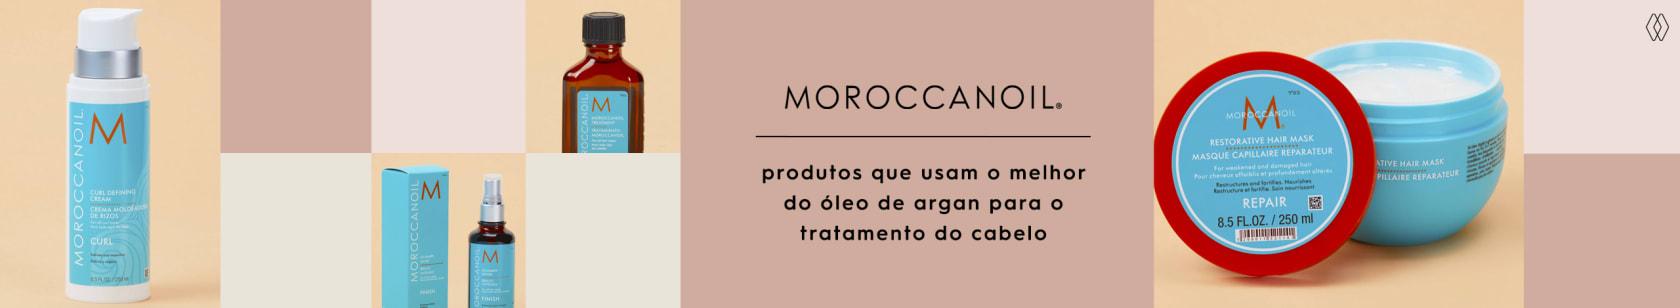 MOROCCANOIL | AMARO